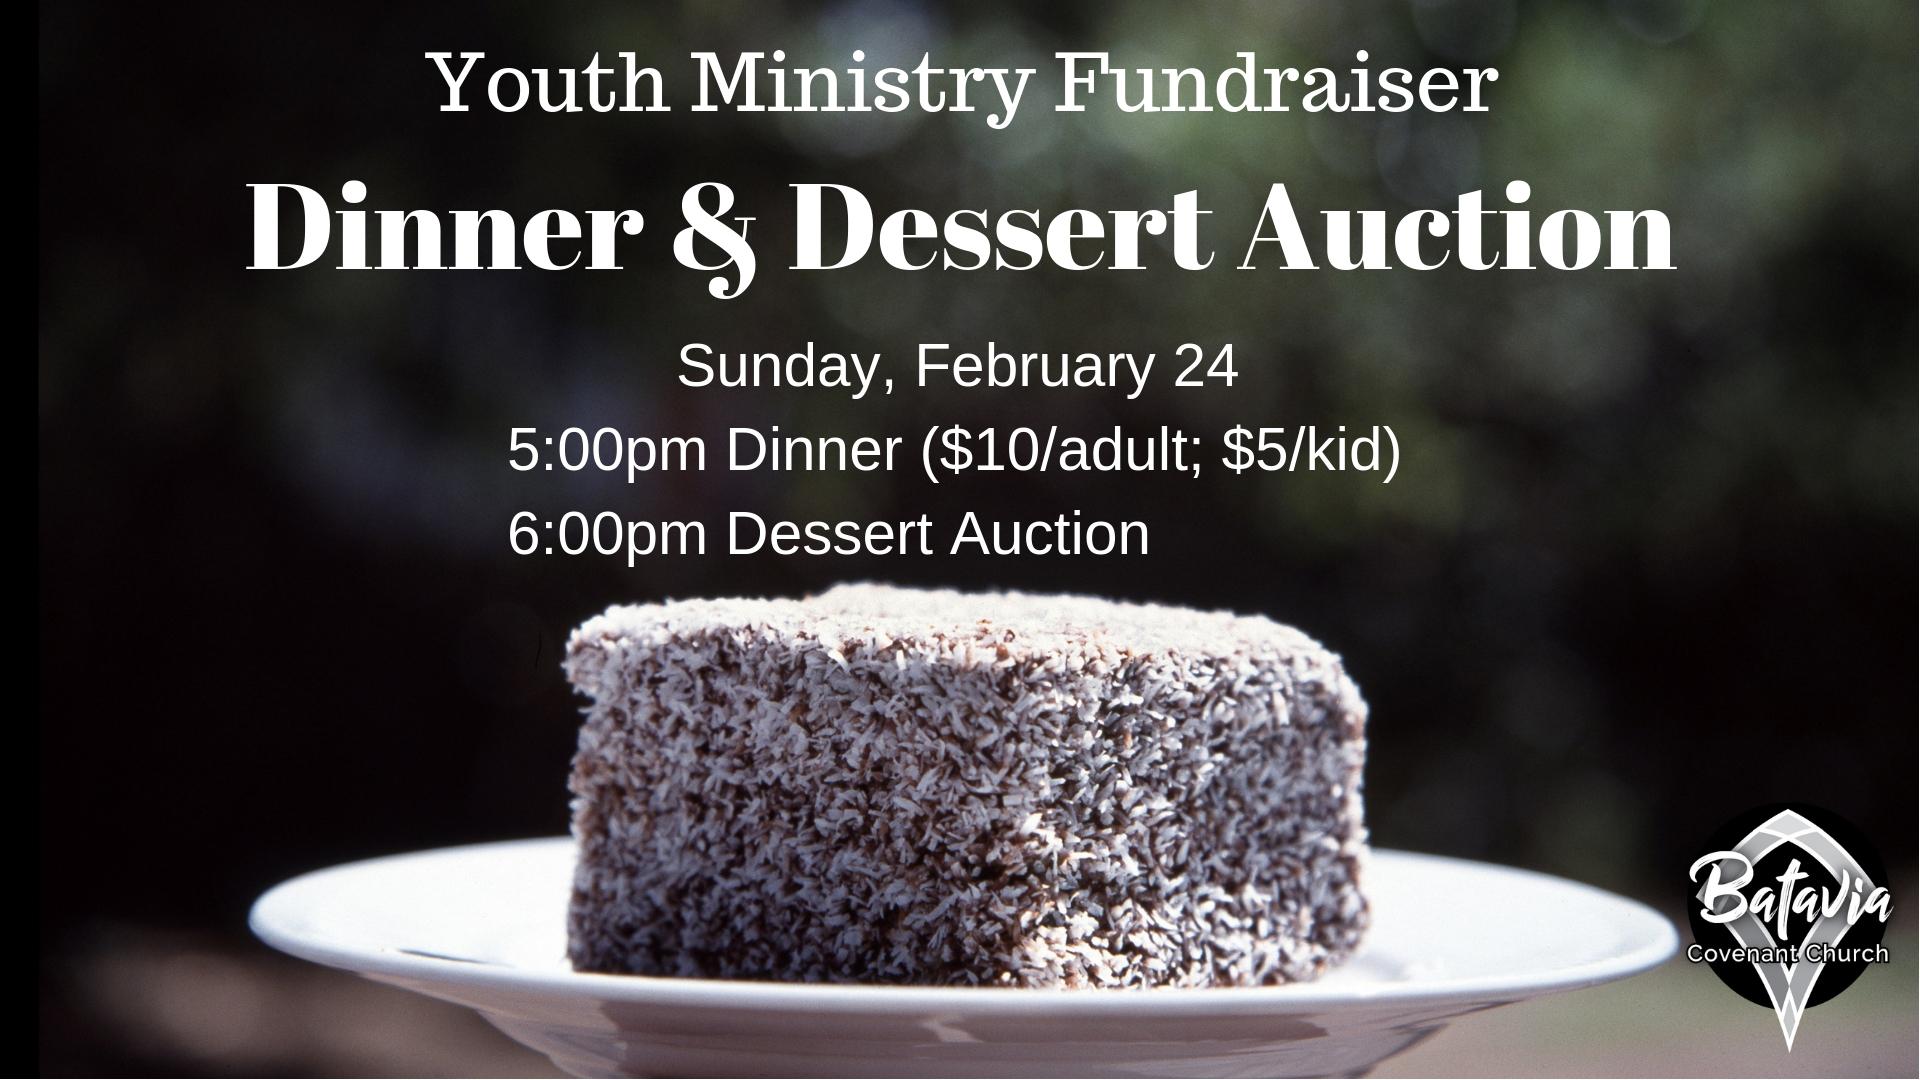 Dinner & Dessert Auction